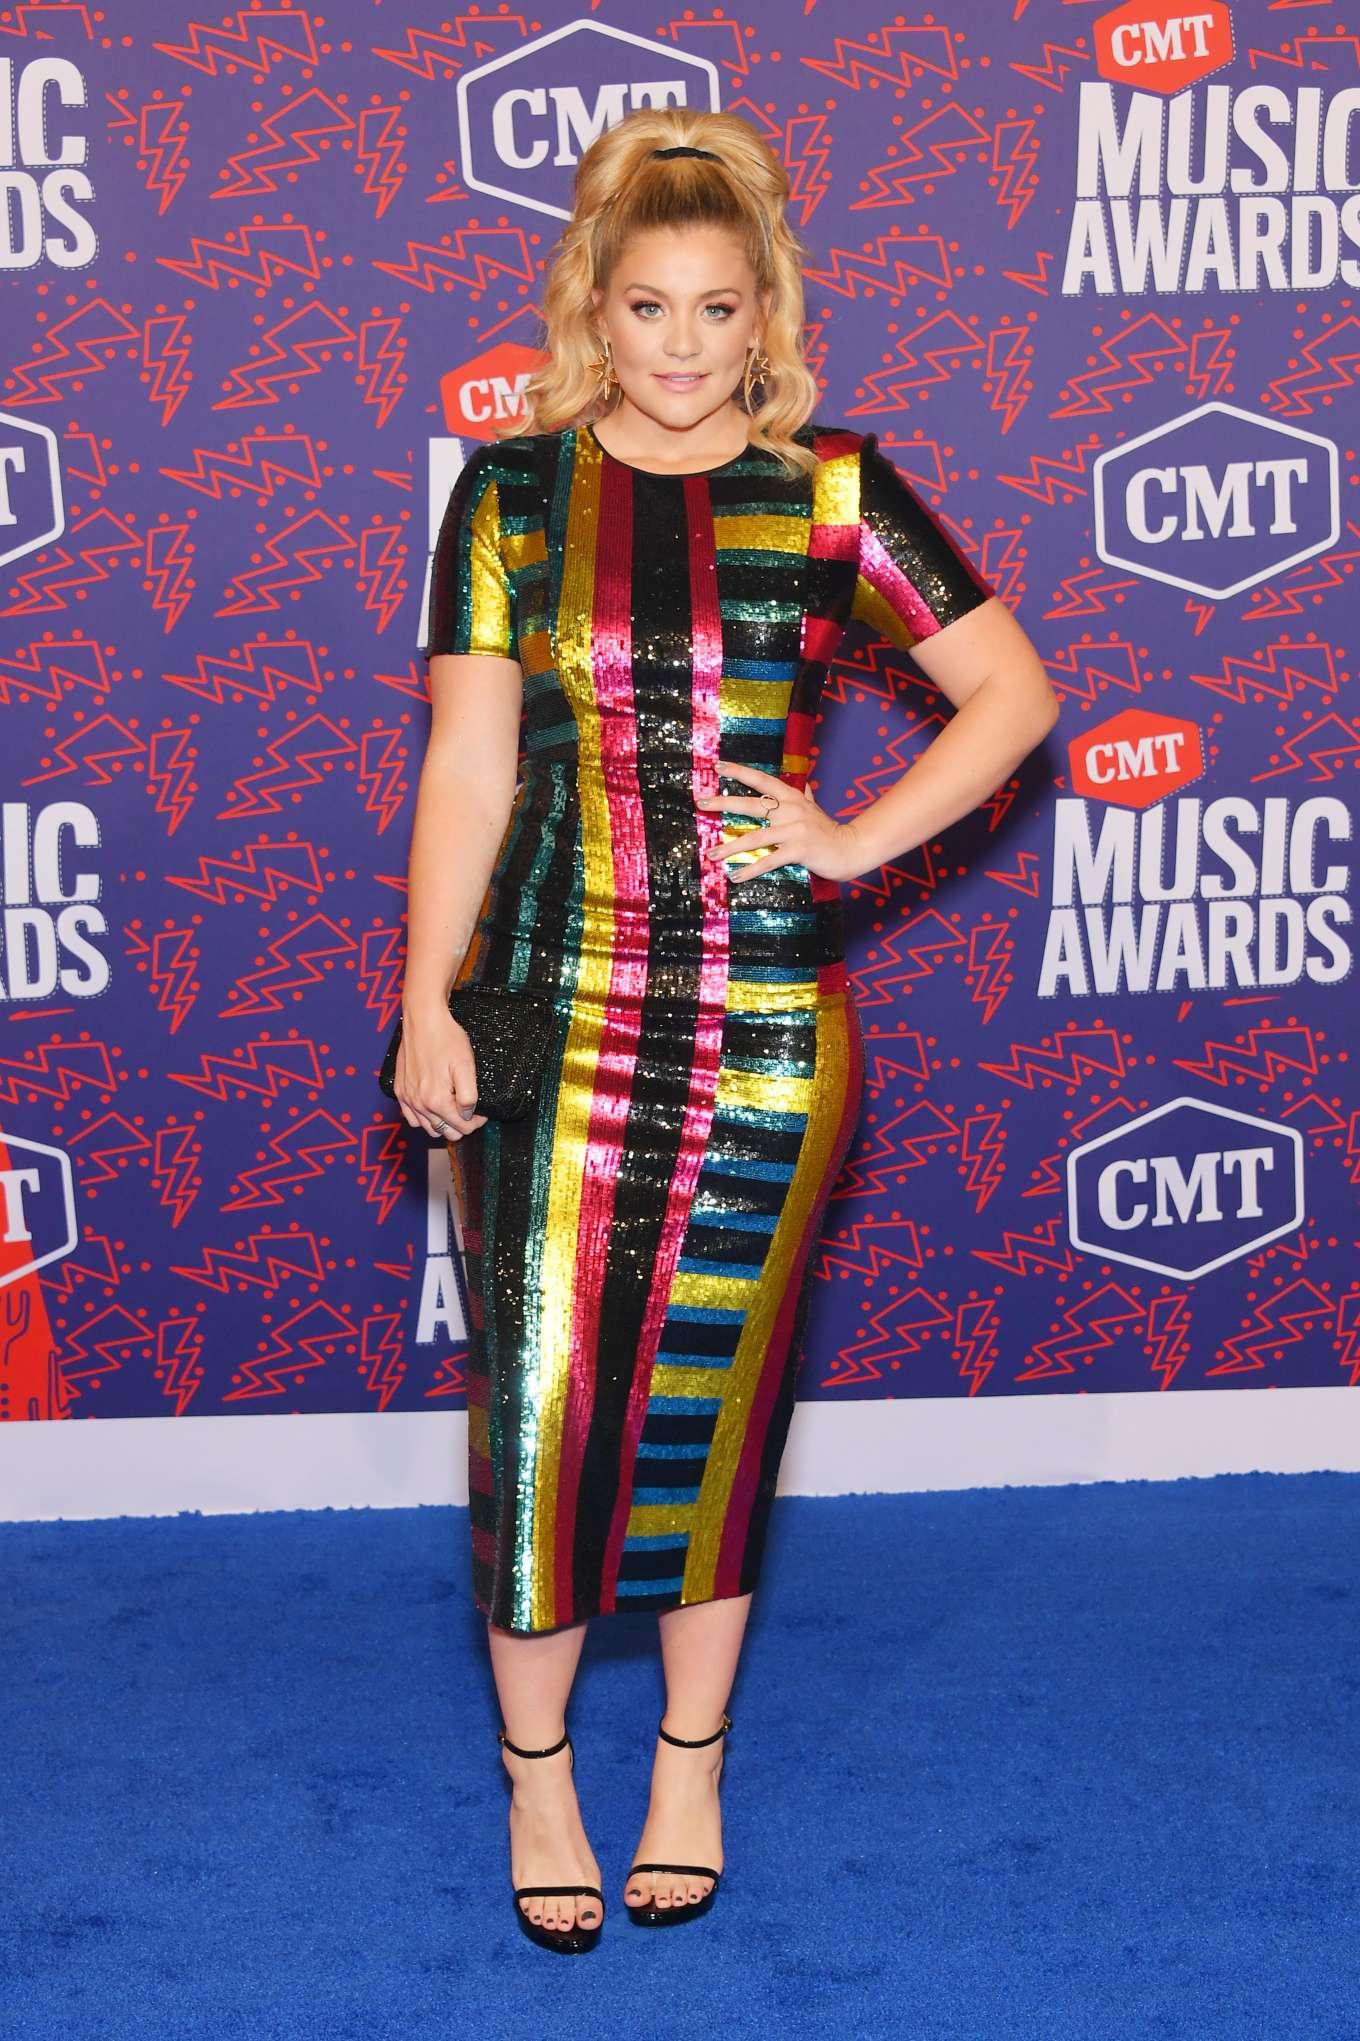 Lauren Alaina - 2019 CMT Music Awards in Nashville